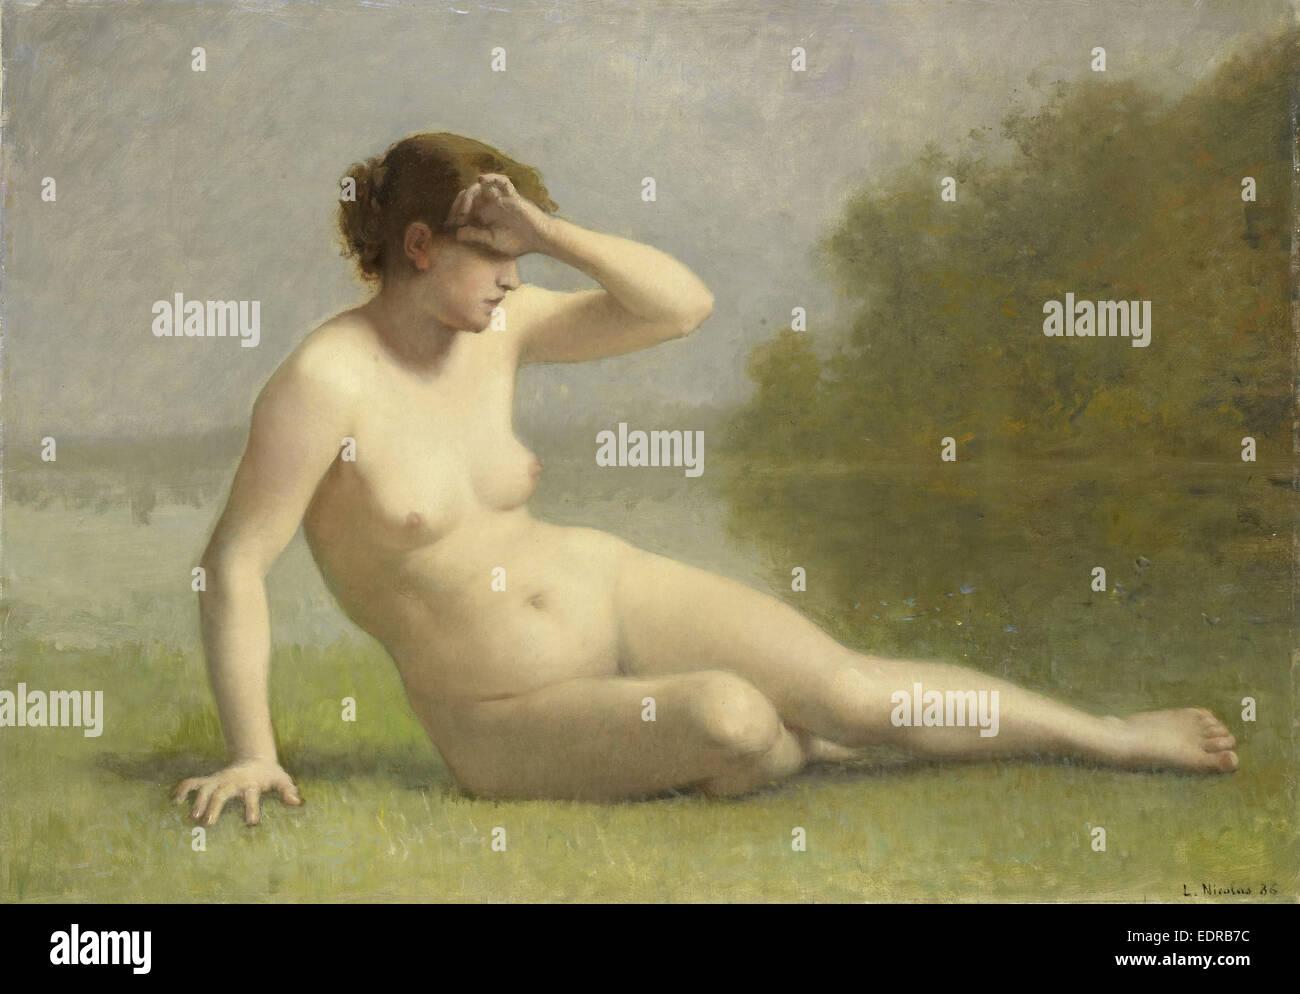 Nymph, L. Nicolas, 1886 - Stock Image